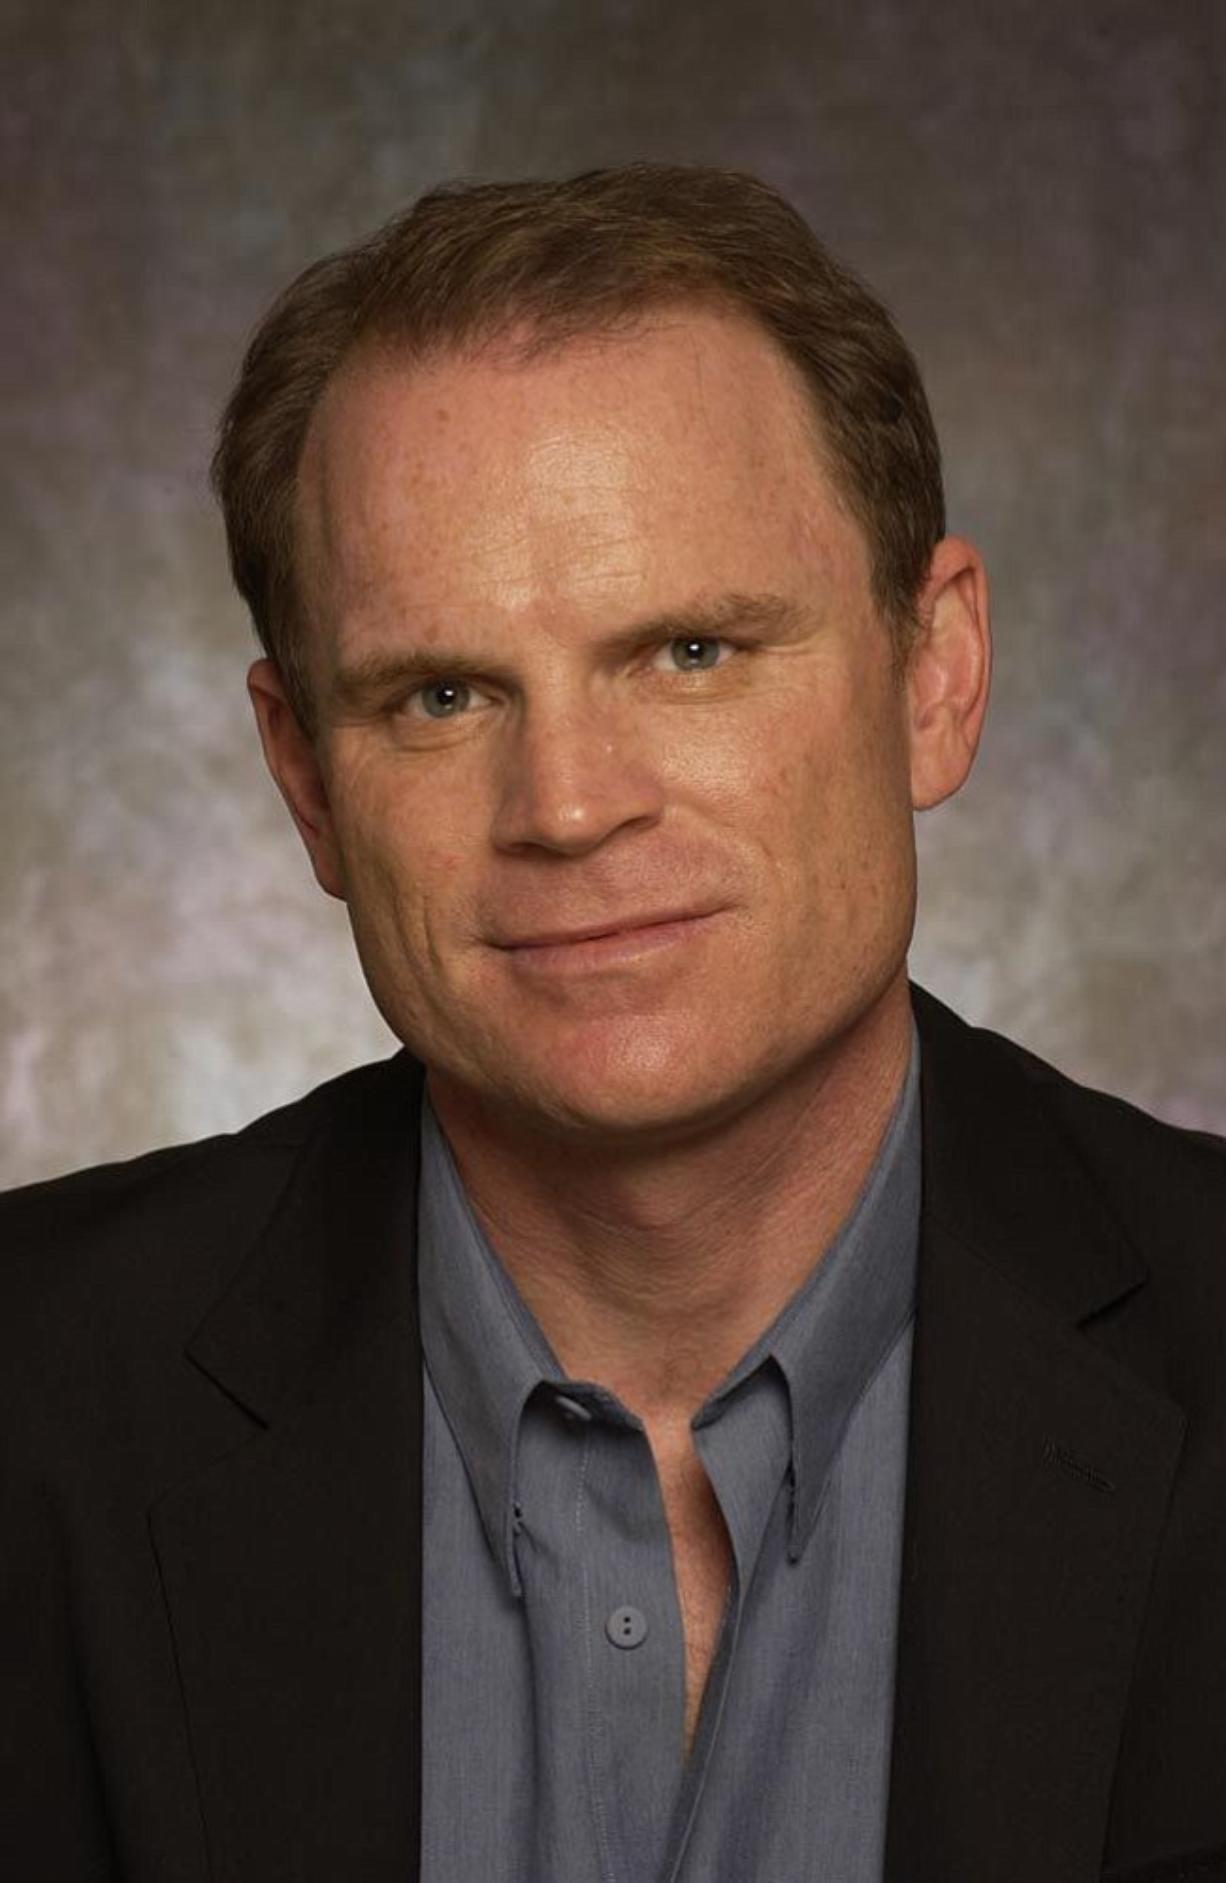 Academy Award-winning executive producer Tom Nunan will speak at the Columbia Gorge International Film Festival.